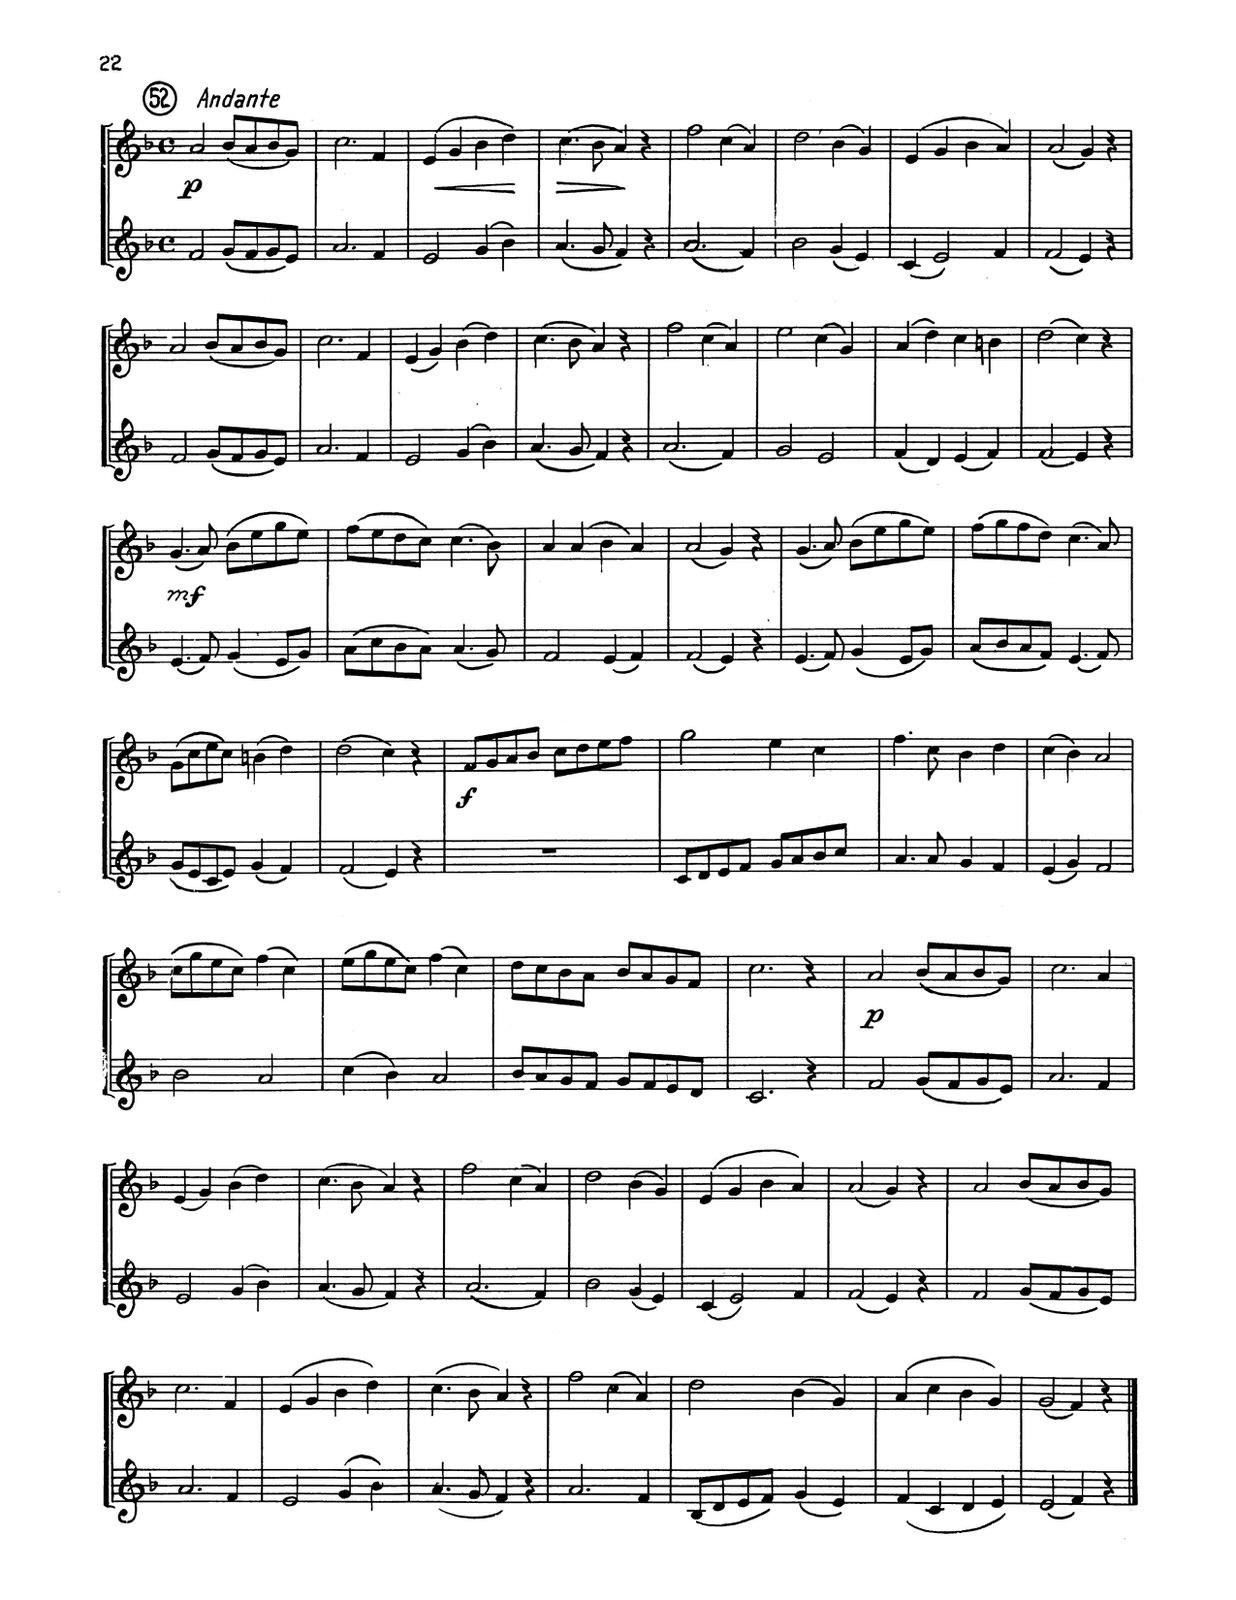 Lahn, 54 Duets for Trumpet-p22